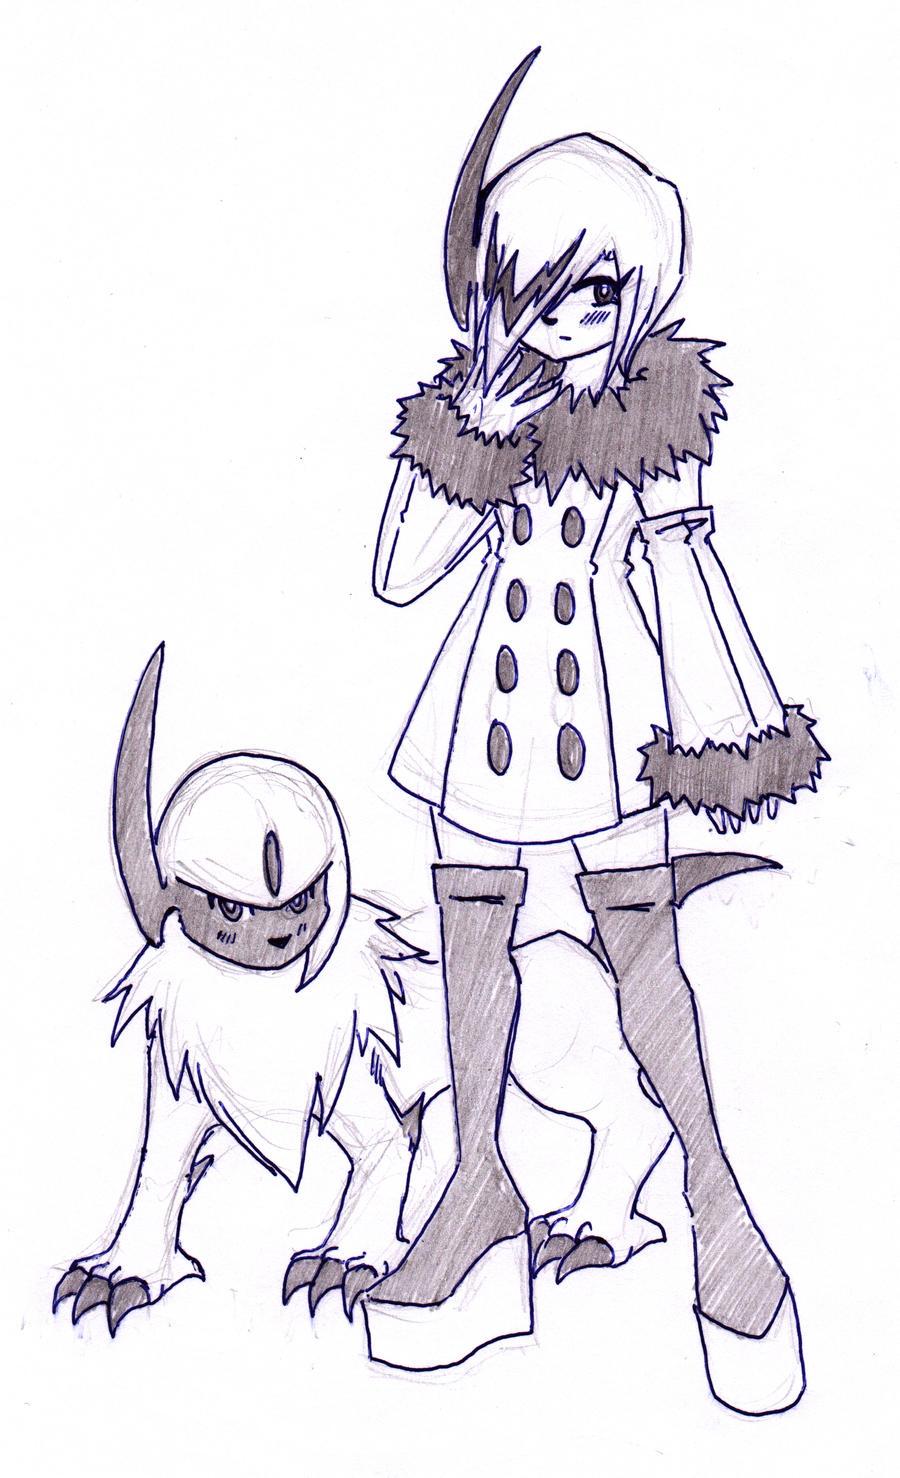 Absol - Human and Pokemon by kamon-san on DeviantArt